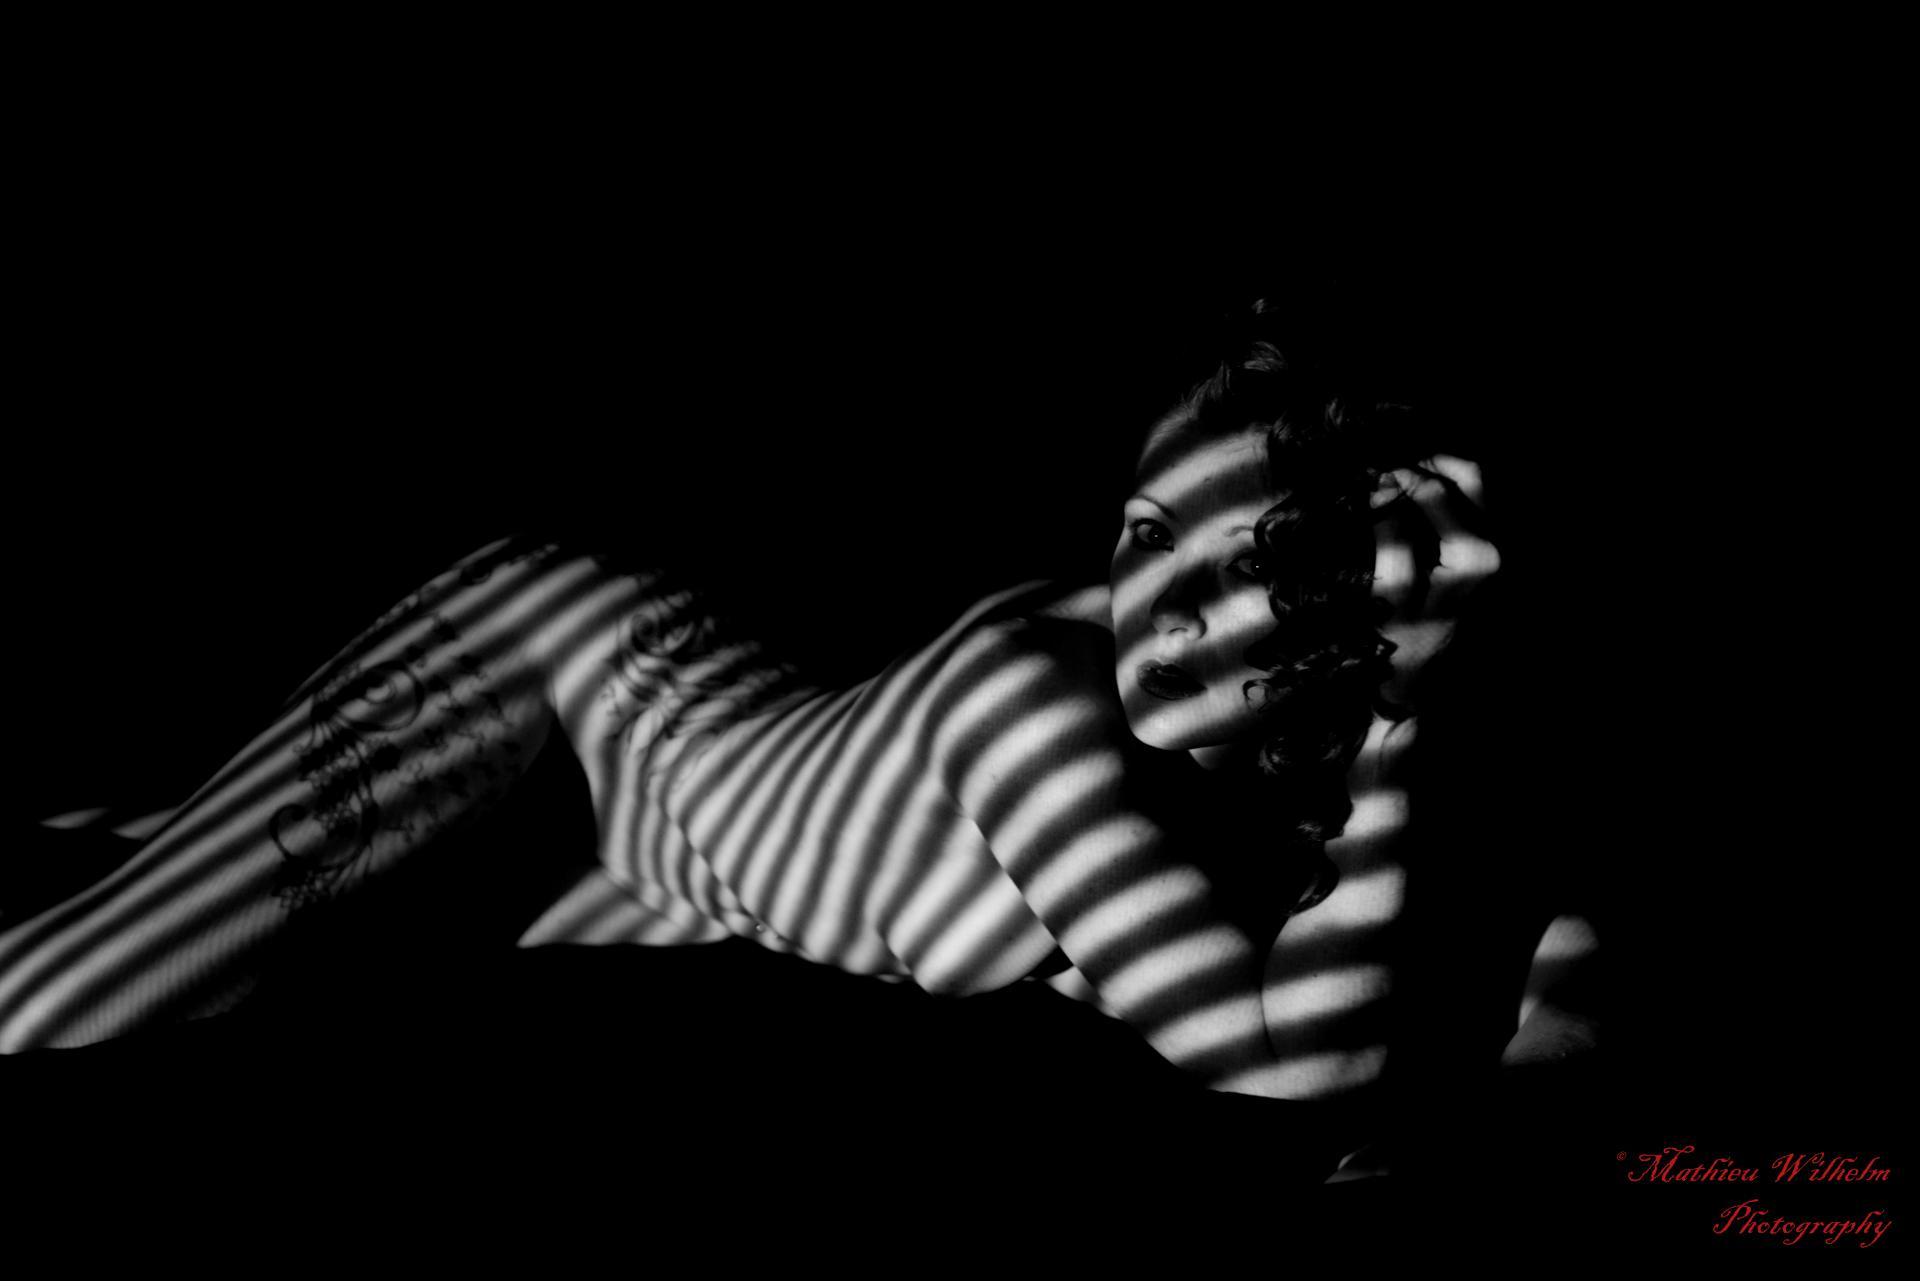 2017-3-04 Megane Ruffio - projection sur